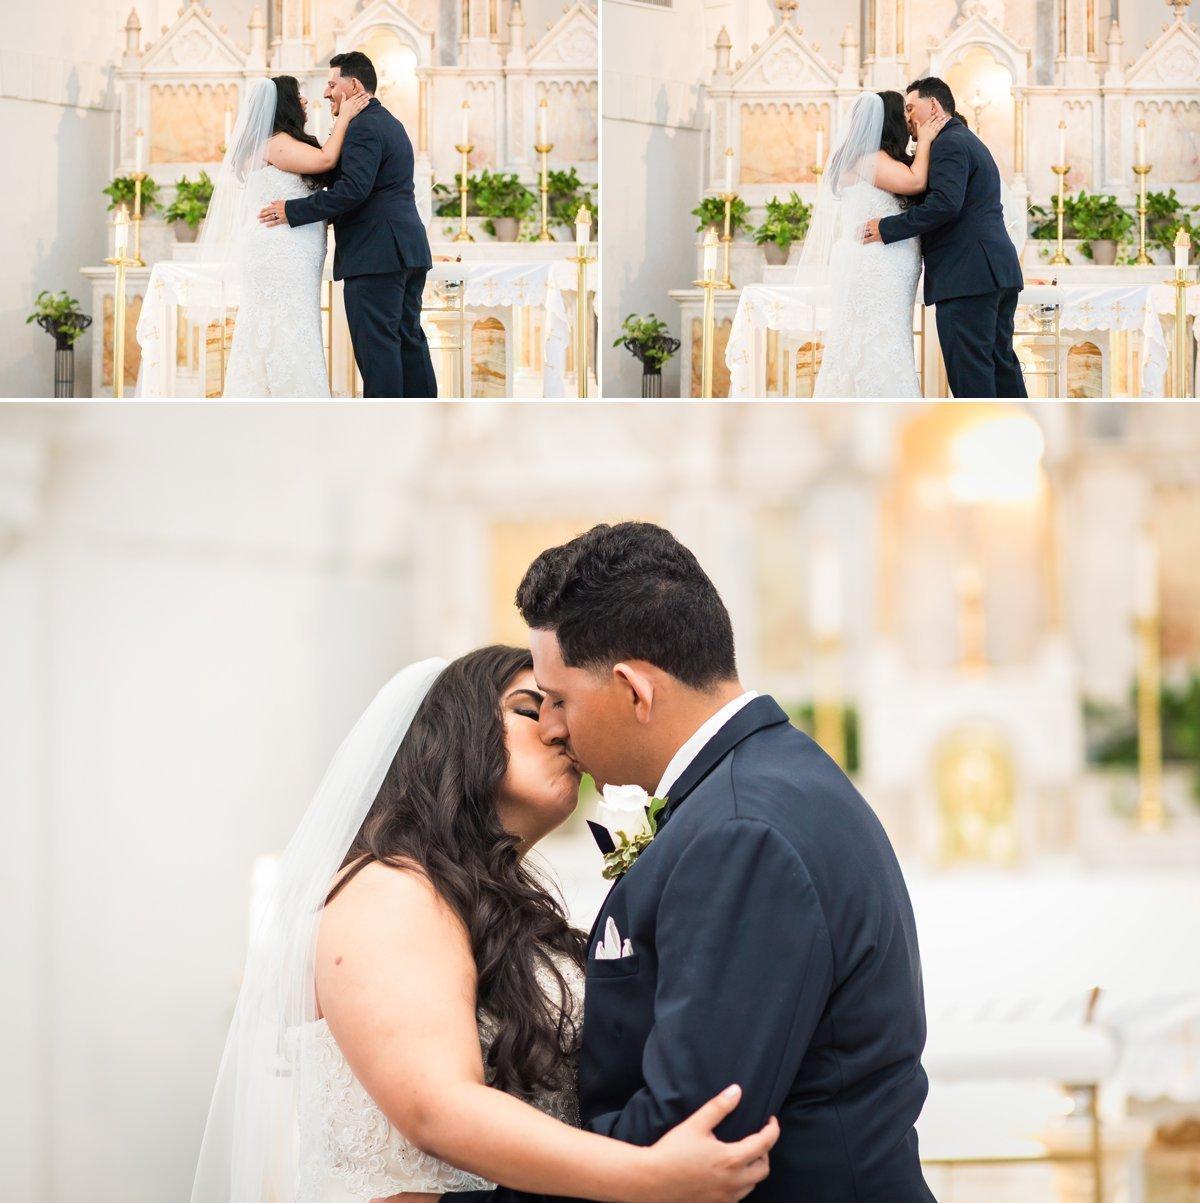 Monica-JJ Wedding 29